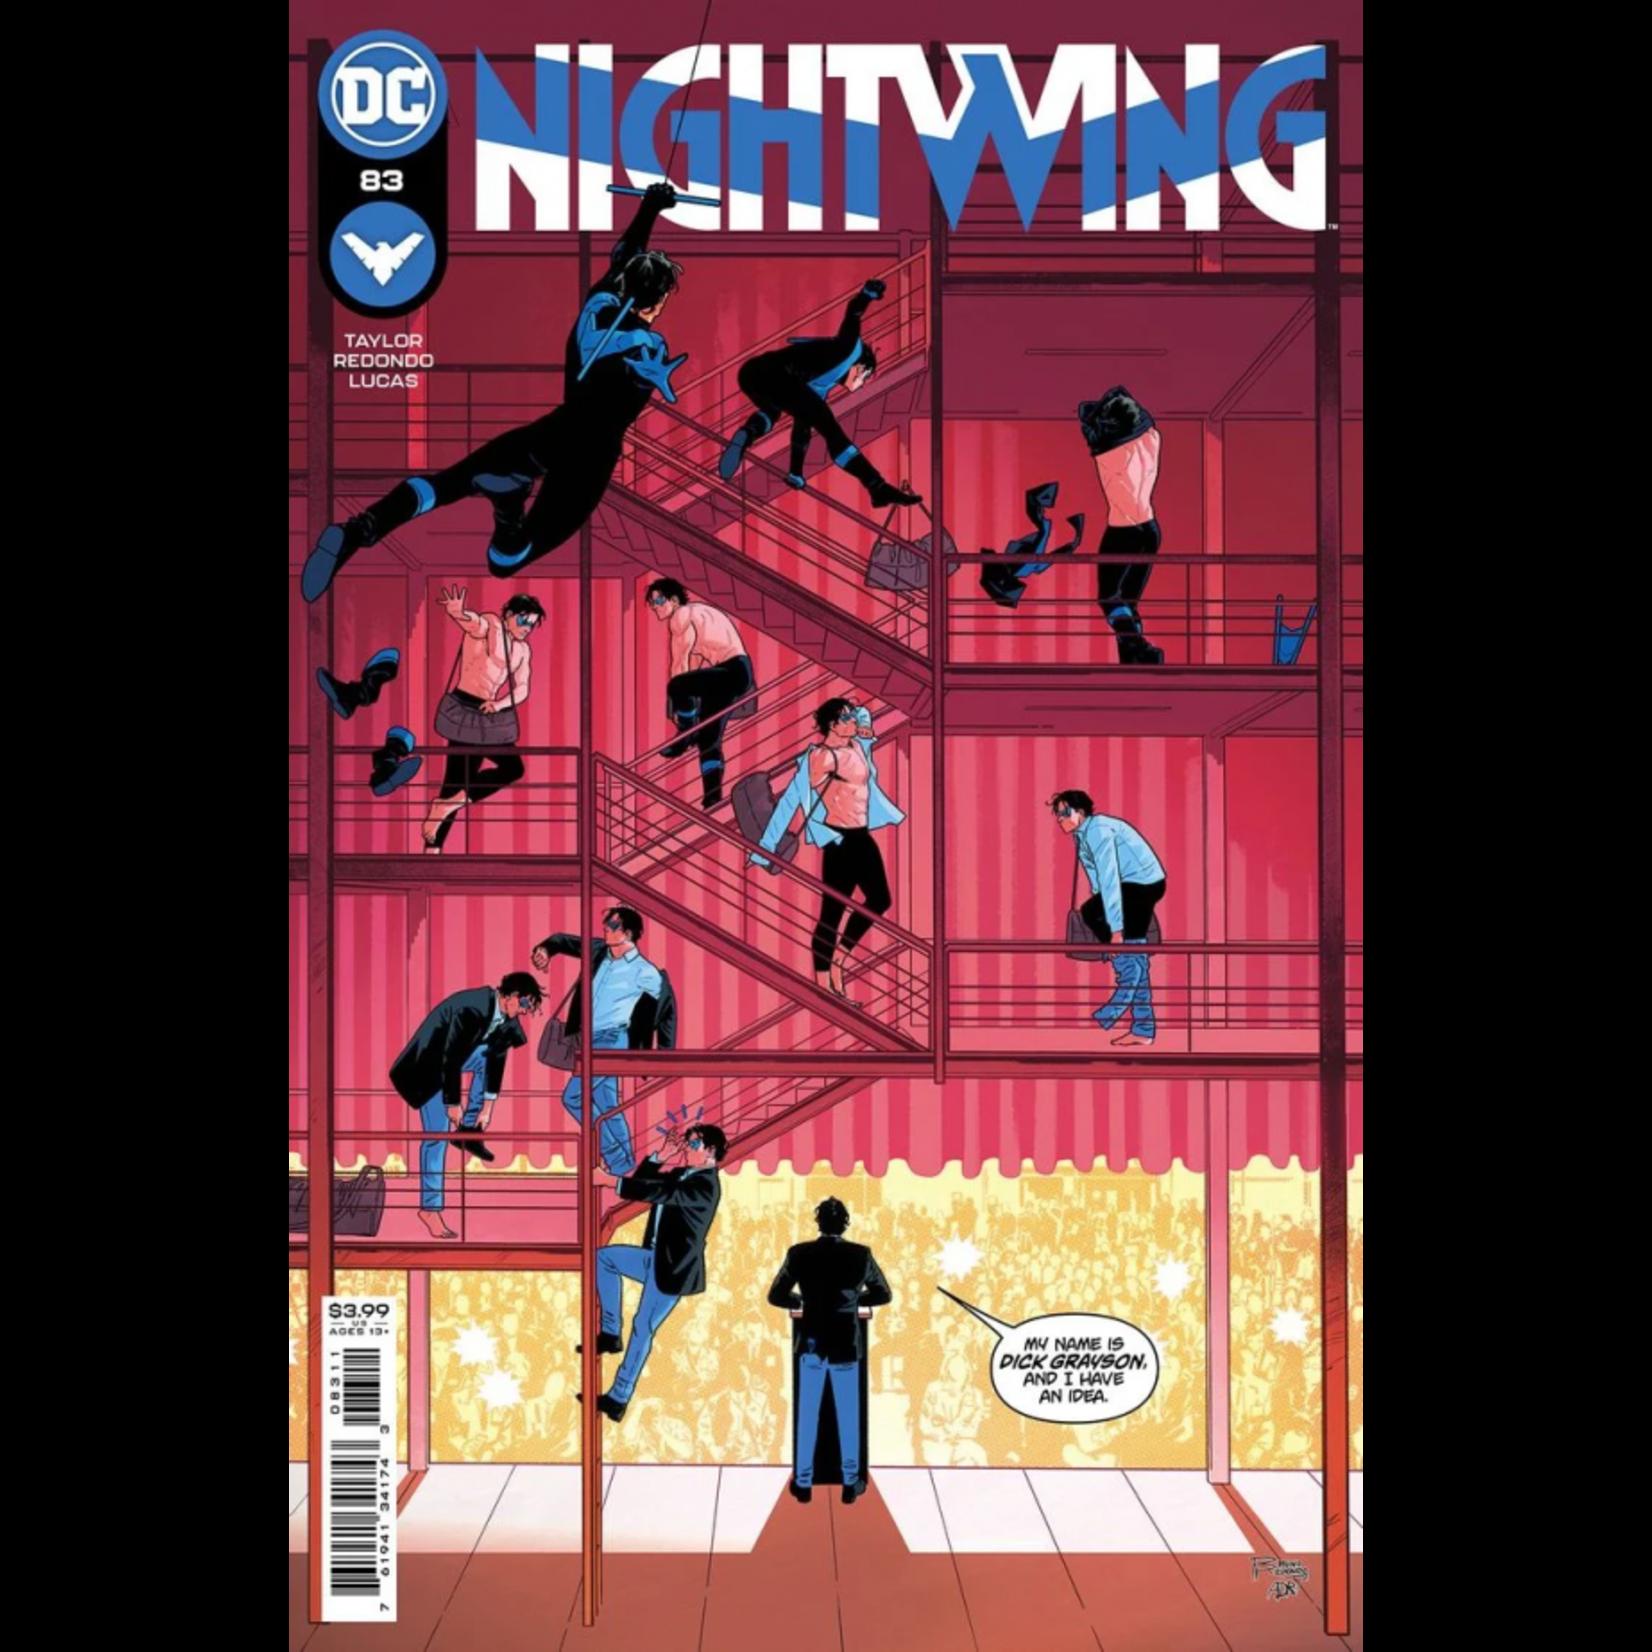 DC Comics Nightwing #83